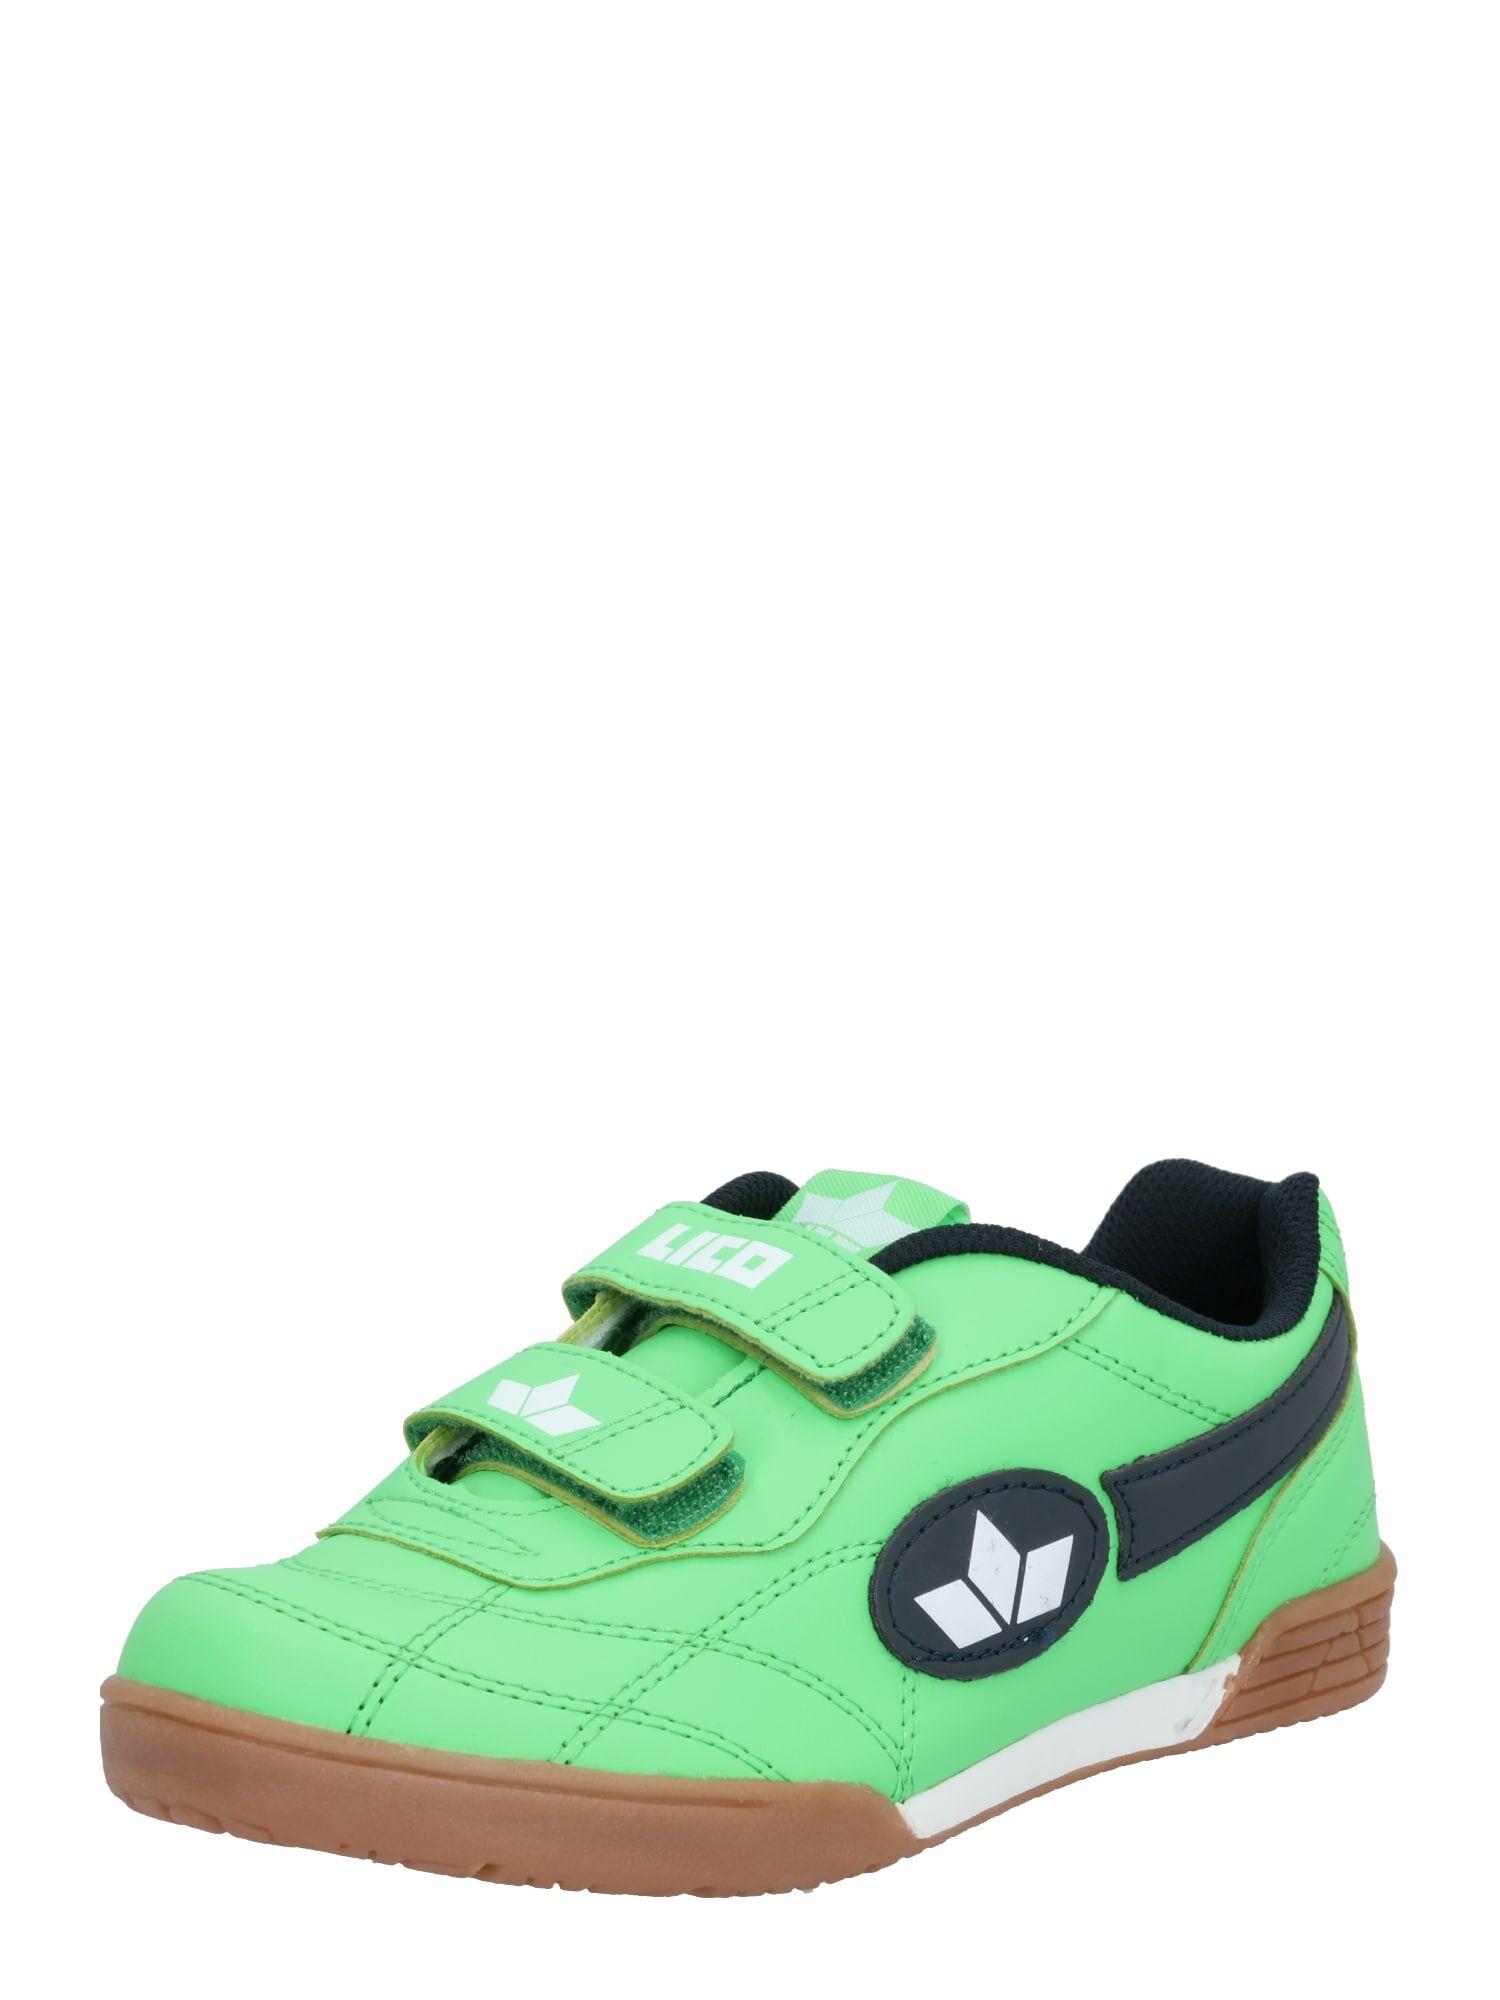 LICO Chaussure de sport 'Bernie V'  - Vert - Taille: 33 - boy